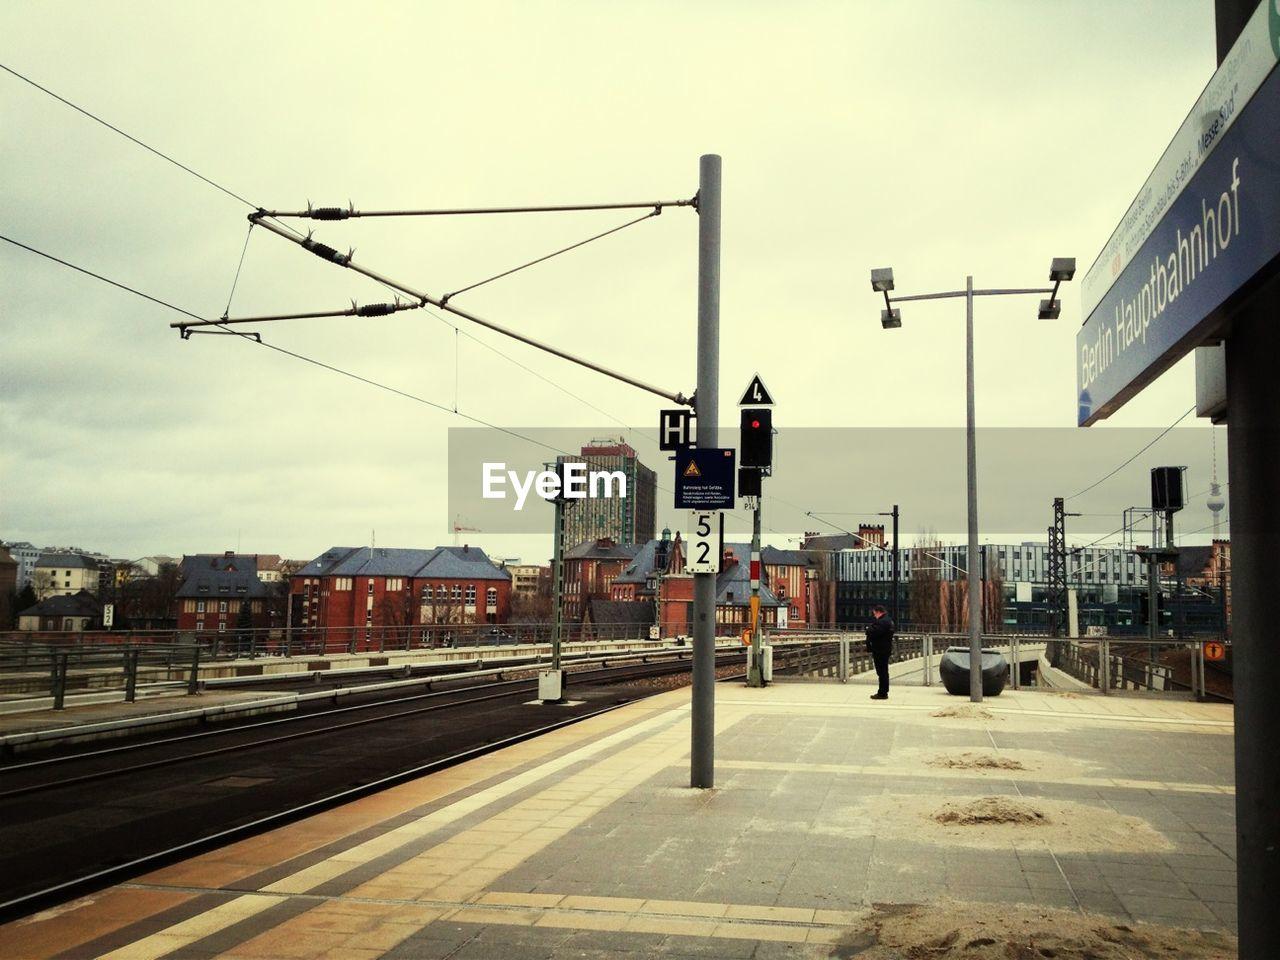 transportation, sky, railroad track, rail transportation, cable, outdoors, cloud - sky, day, public transportation, no people, building exterior, built structure, railway signal, architecture, nature, city